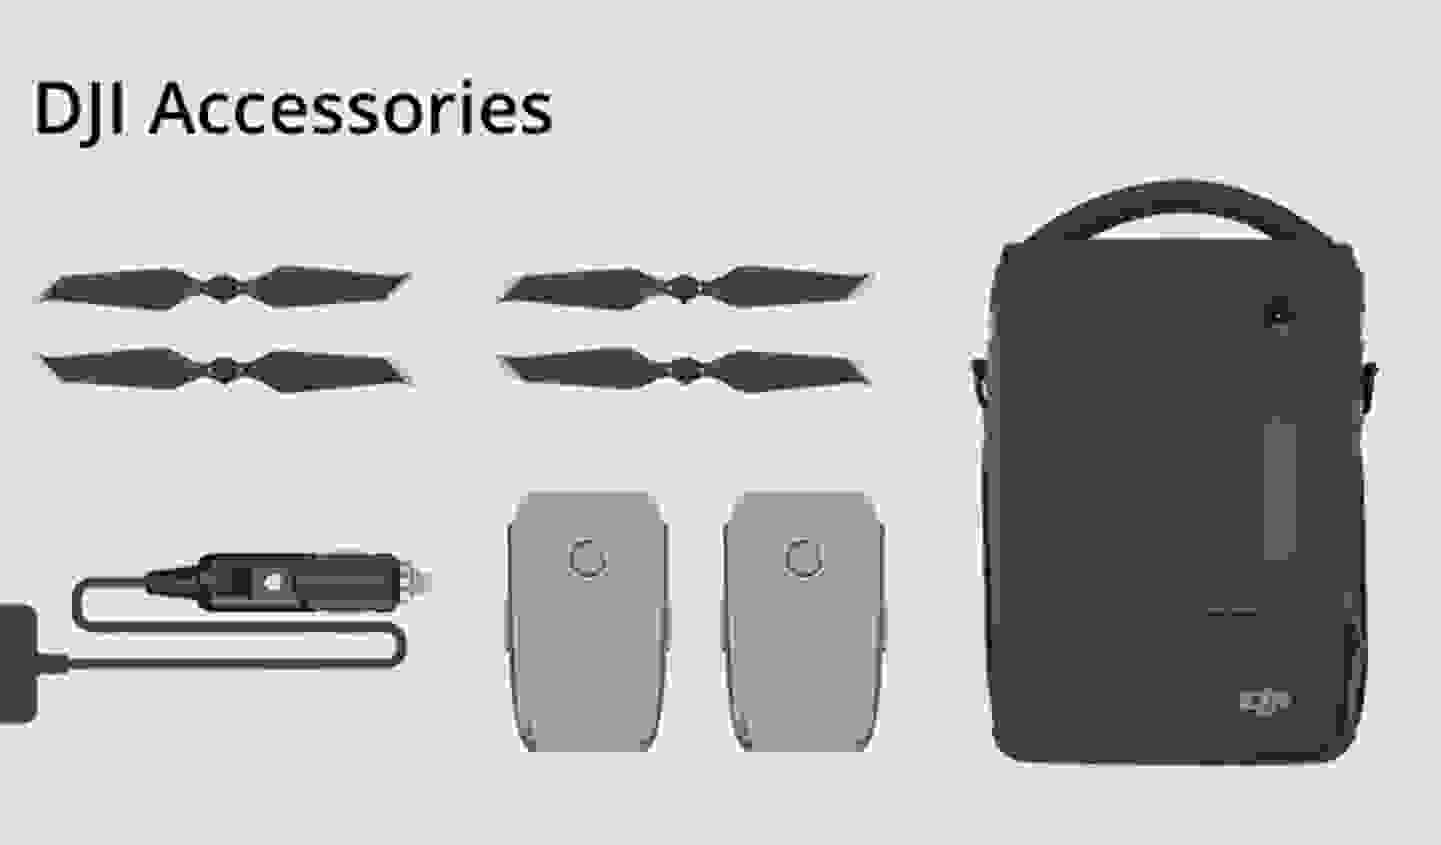 DJI Accessoires